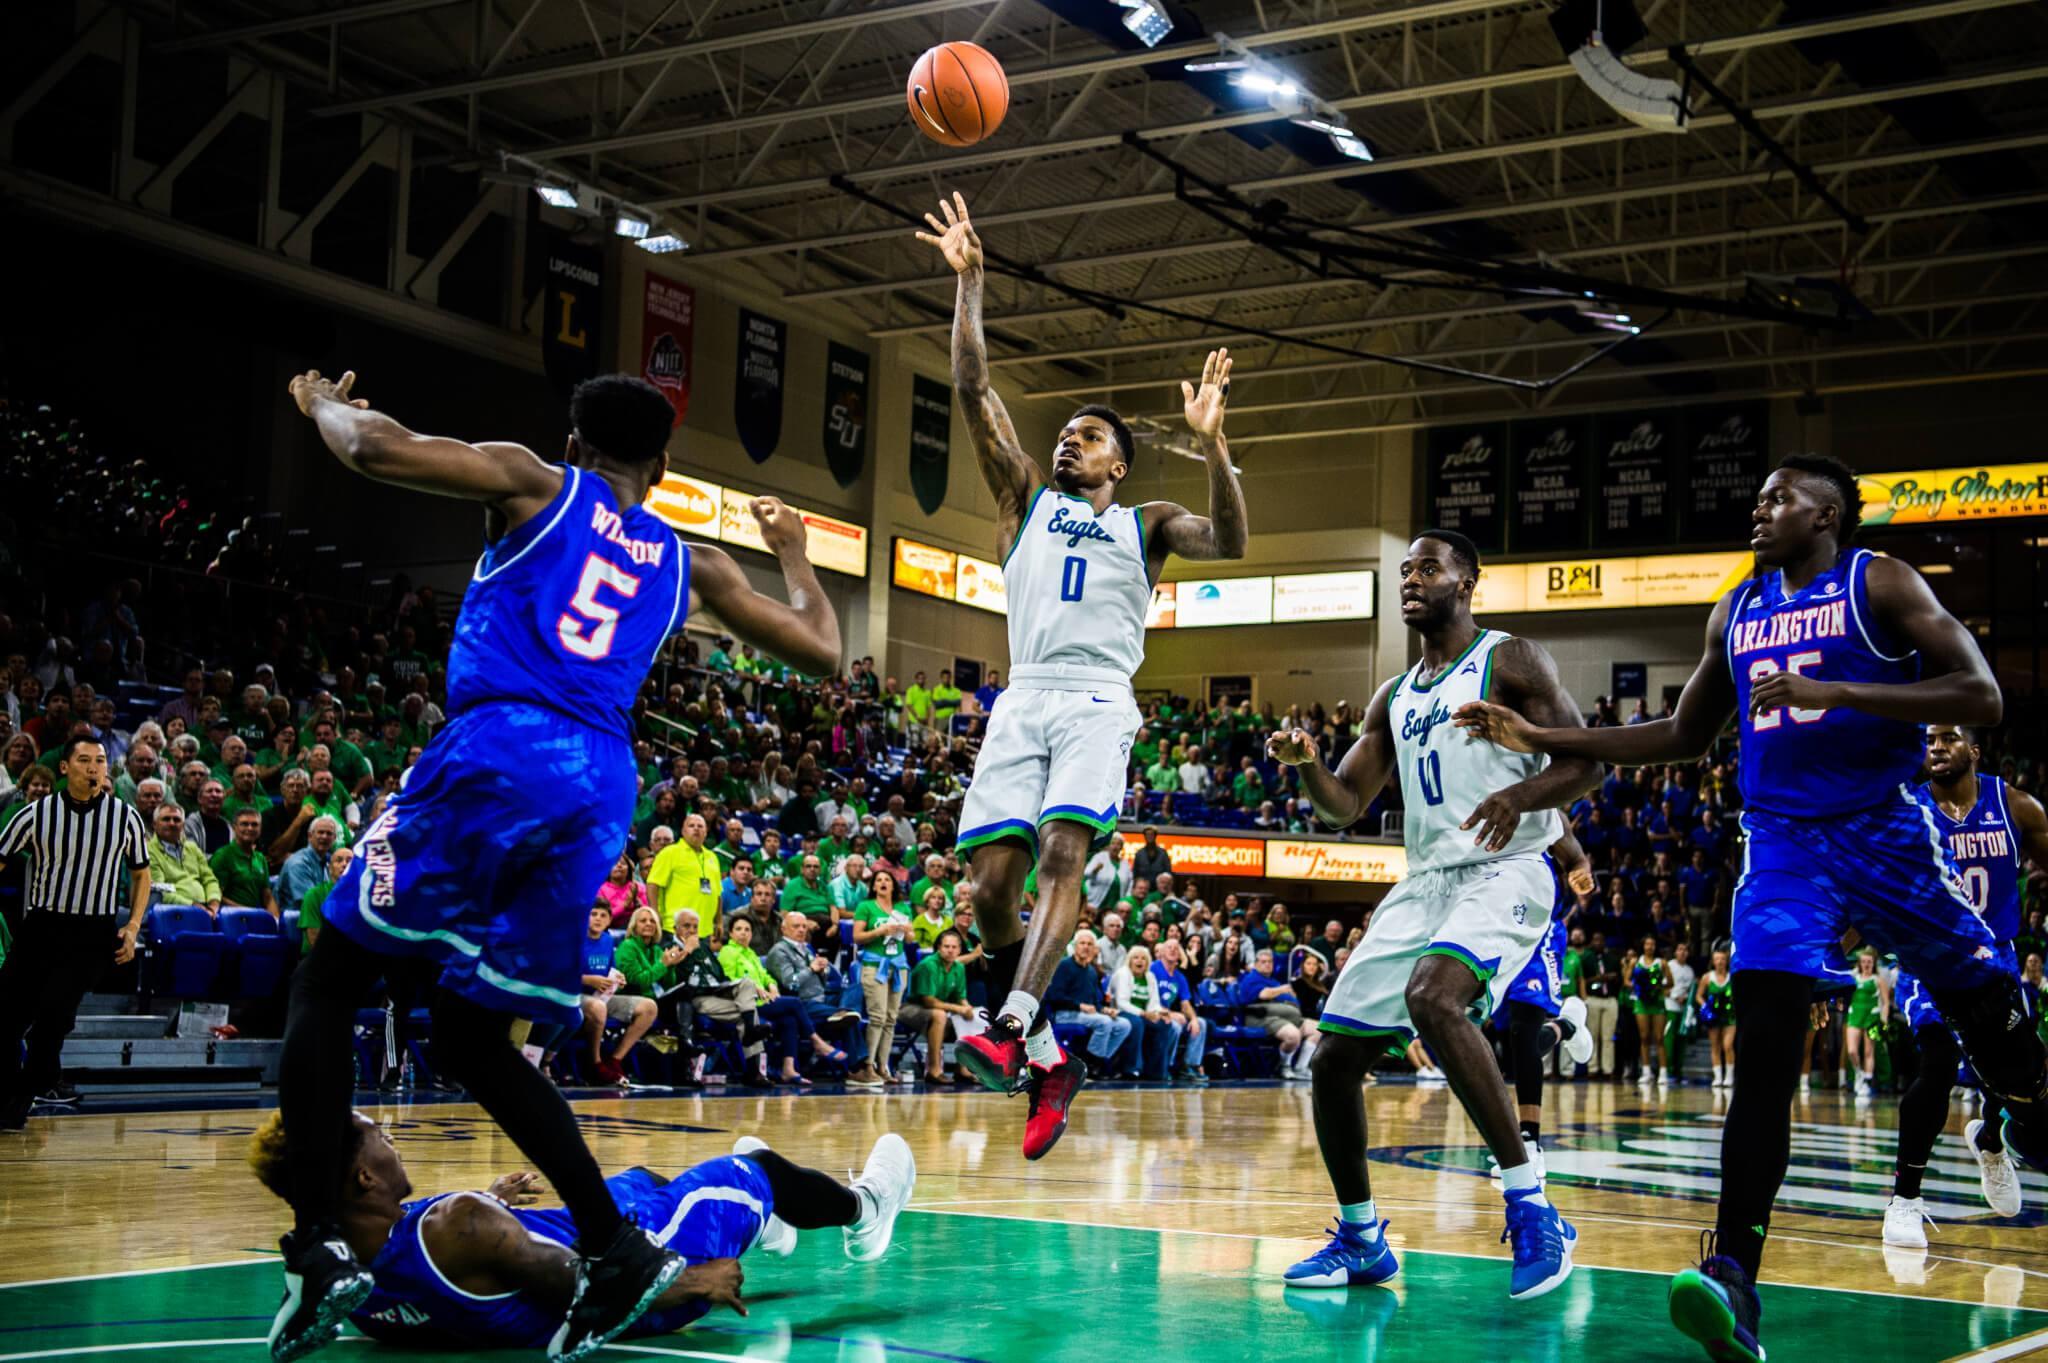 FGCU men's basketball outlast Georgia Southern to extend win streak to four